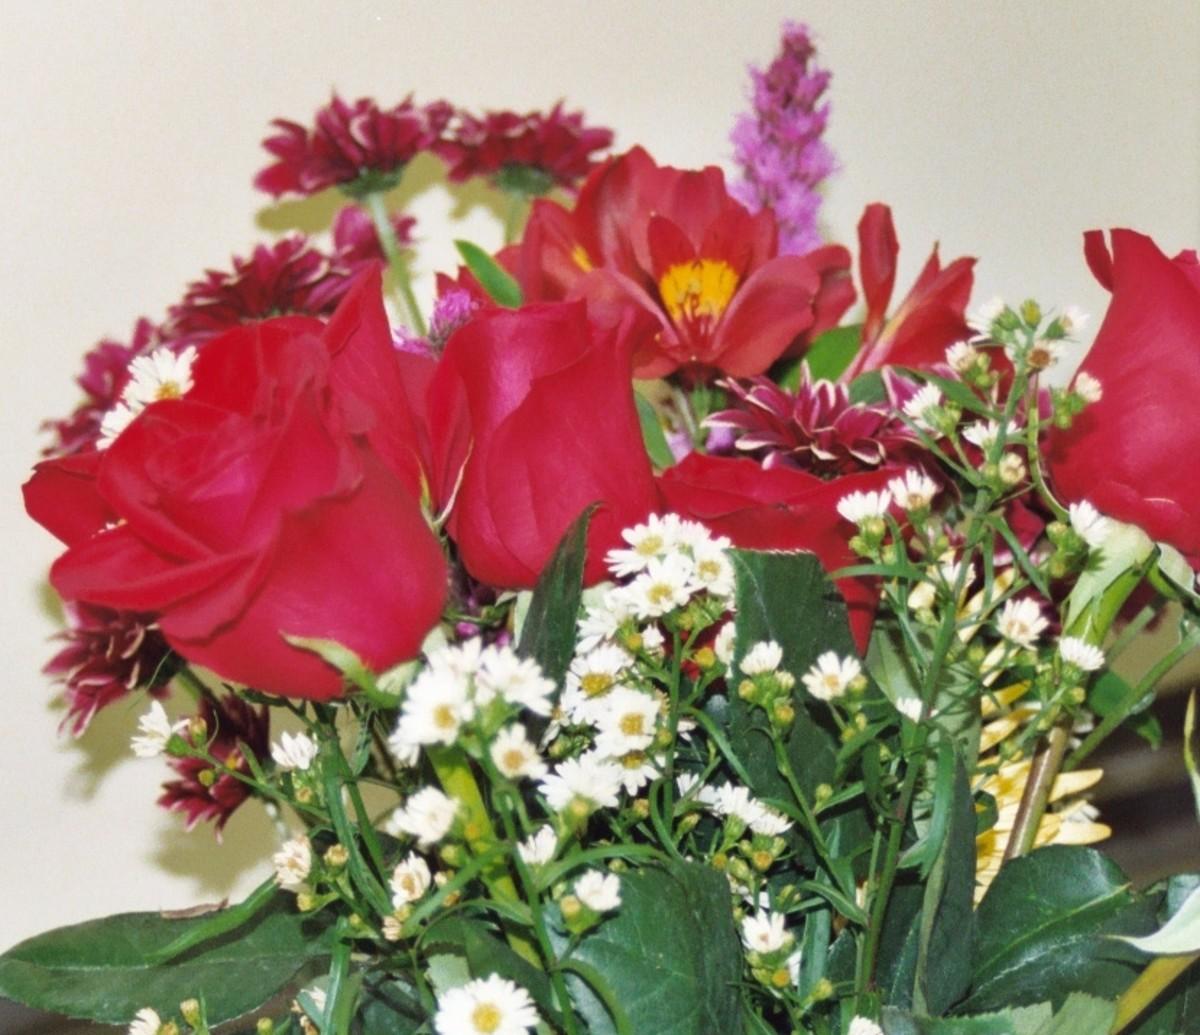 Women Celebrating Birthday Milestones and Blessings